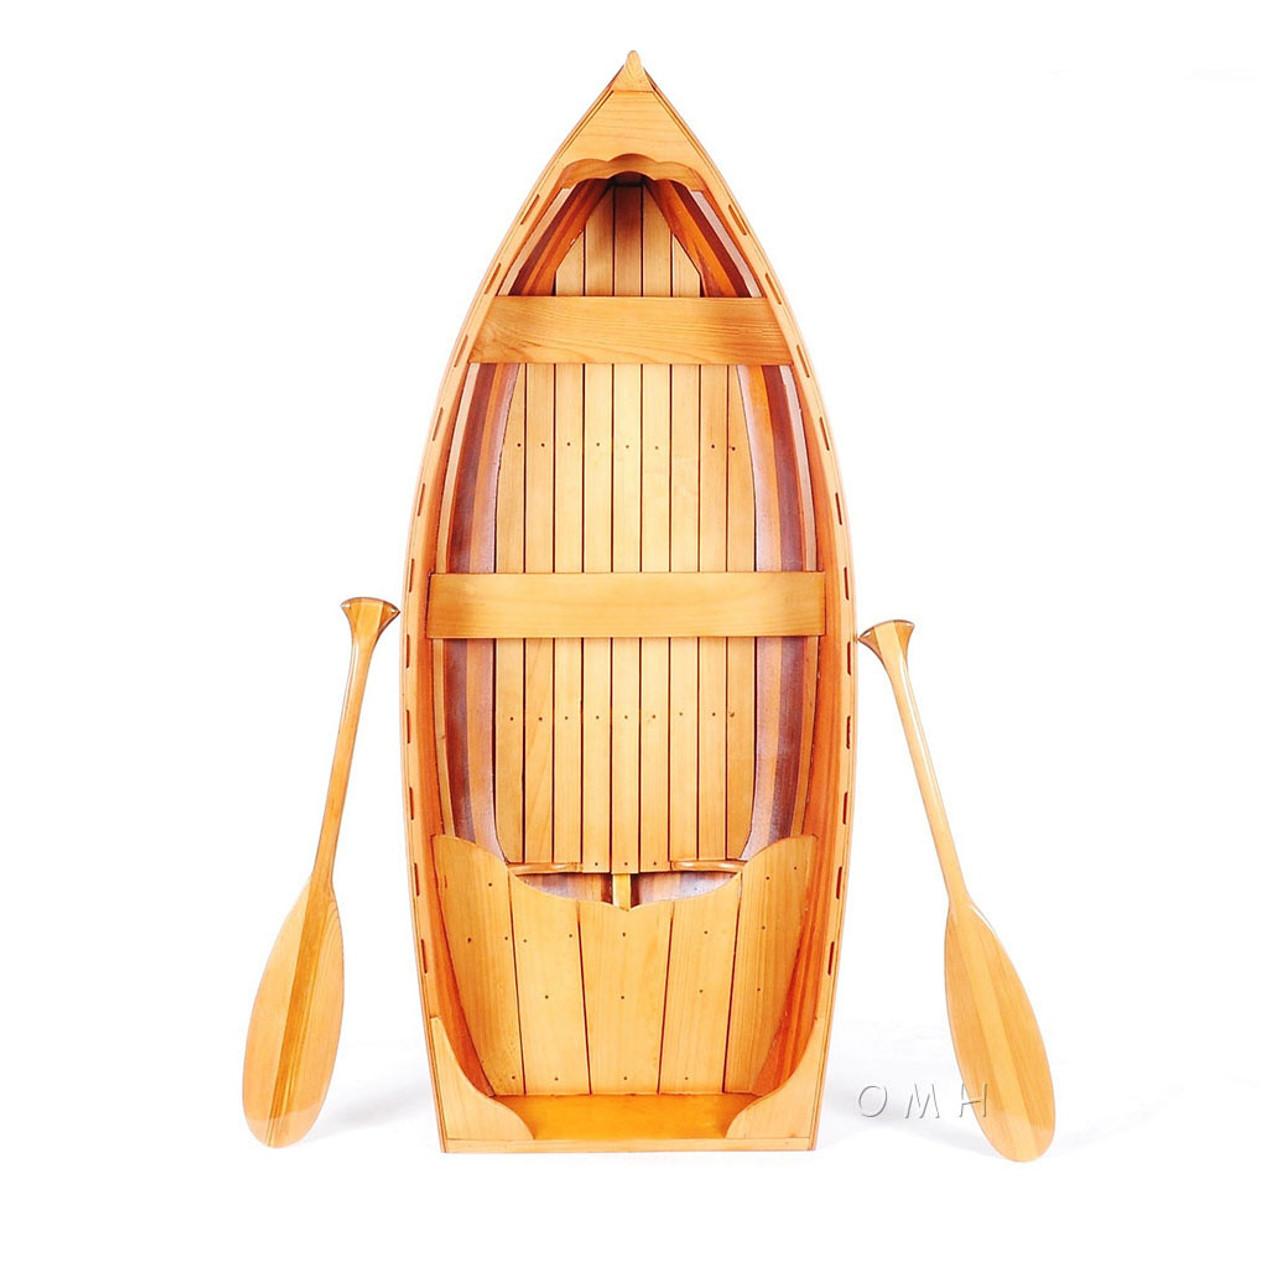 Display Cedar Strip Built Whitehall Dinghy Row Boat